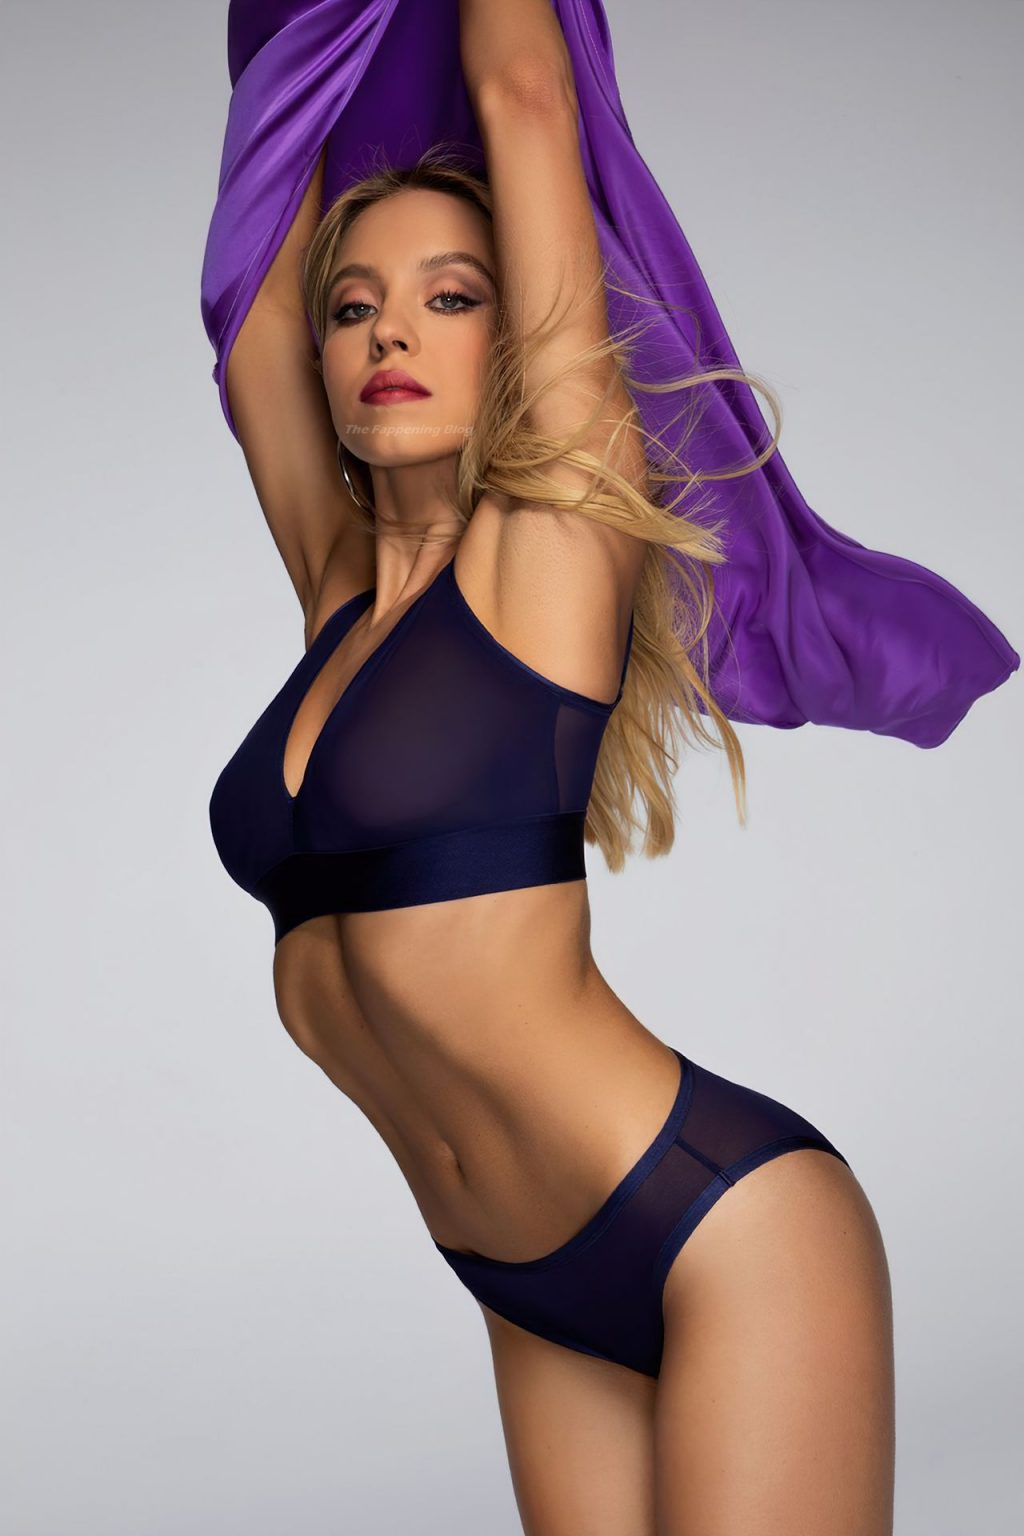 Sydney Sweeney Sexy (12 Photos)